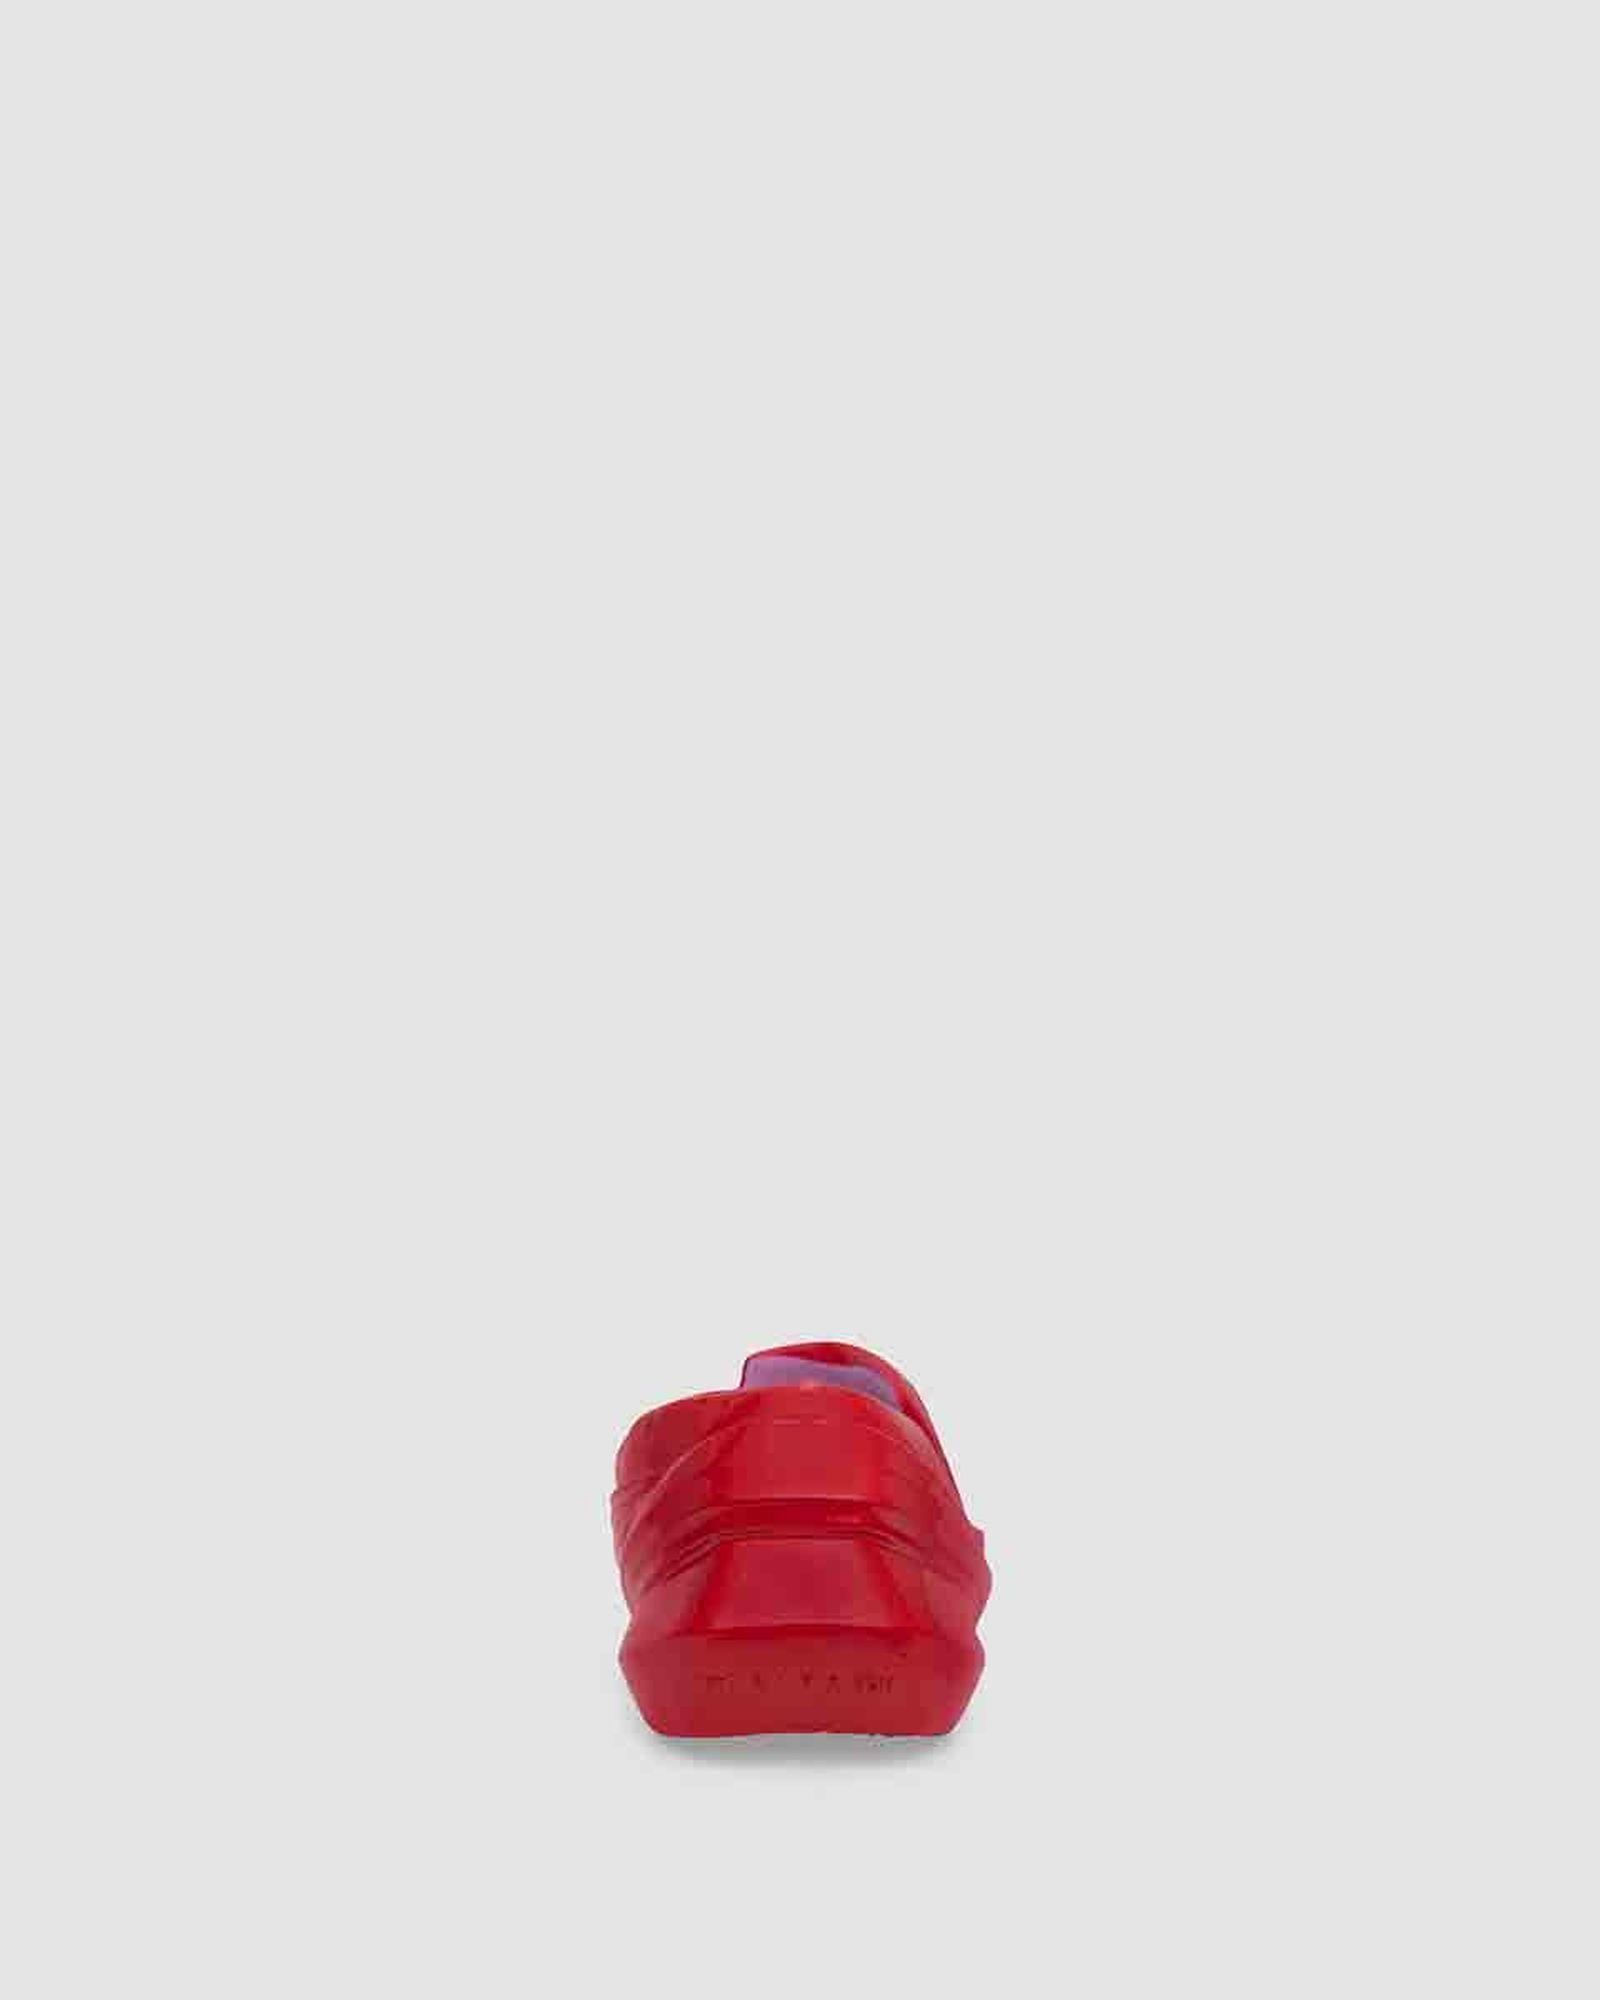 1017-alyx-9sm-mono-slip-on-red-pink-release-info-1-03